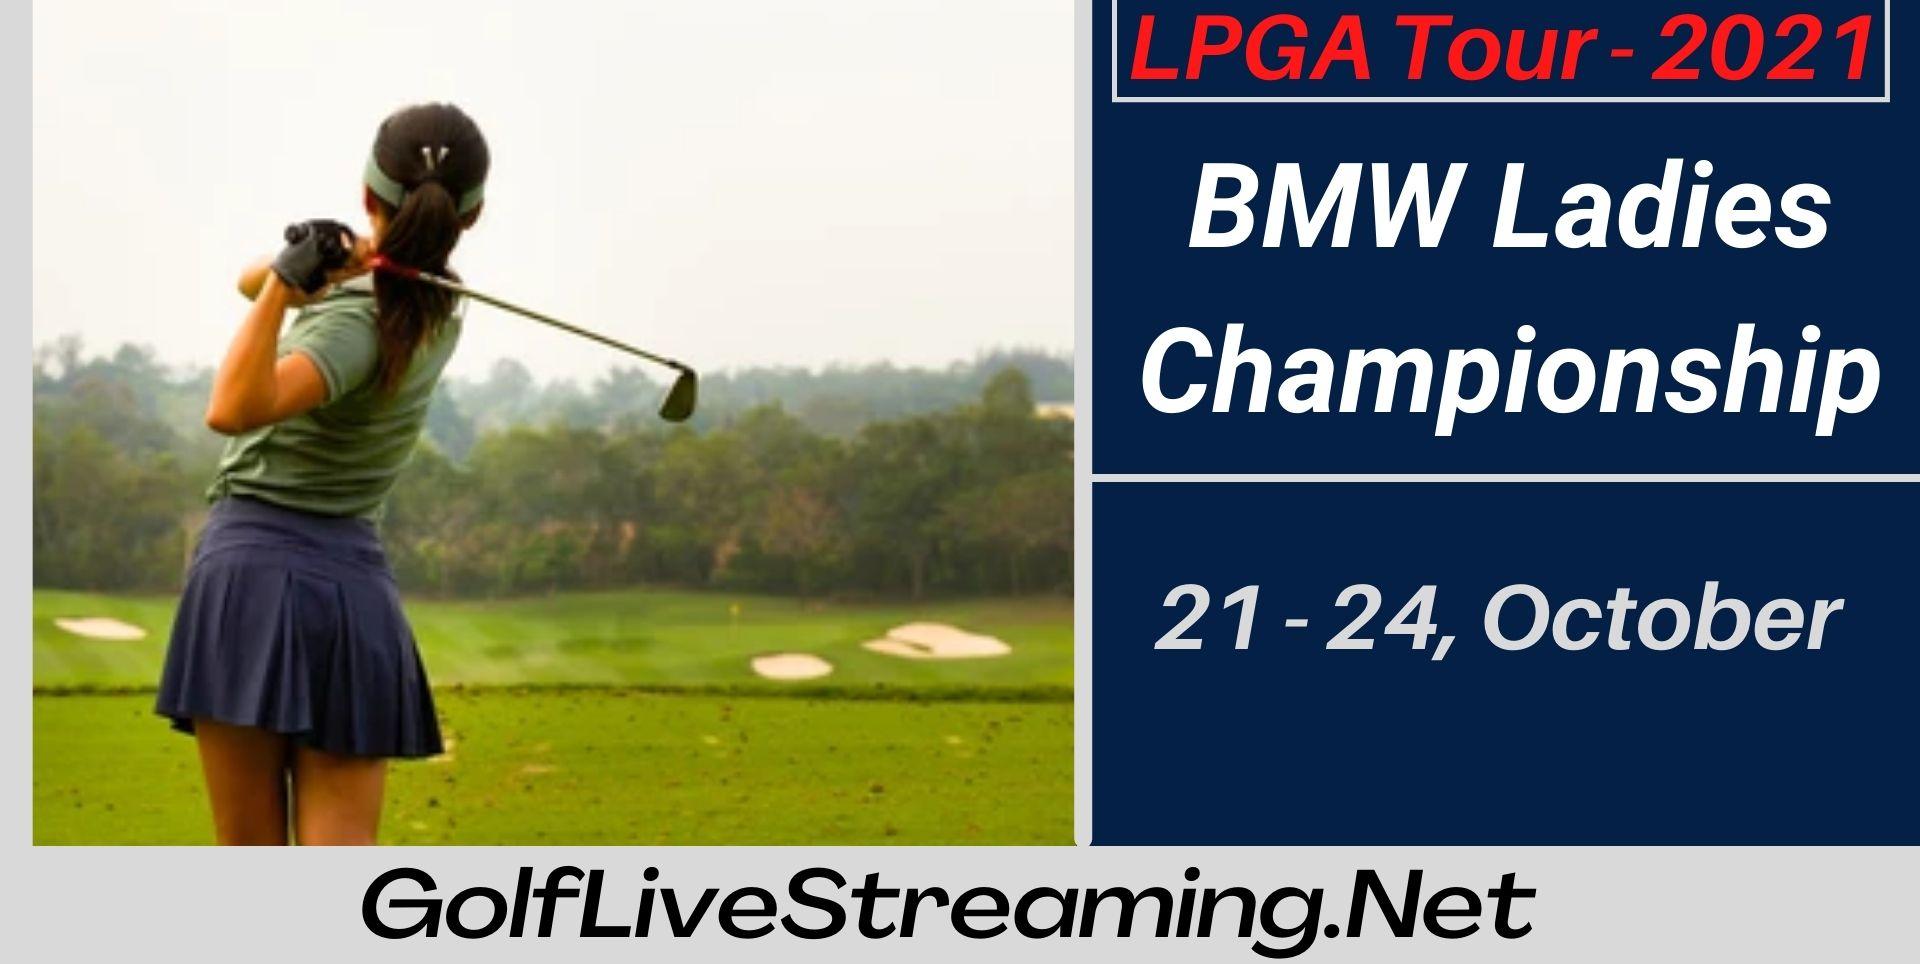 BMW Ladies Championship Live Stream